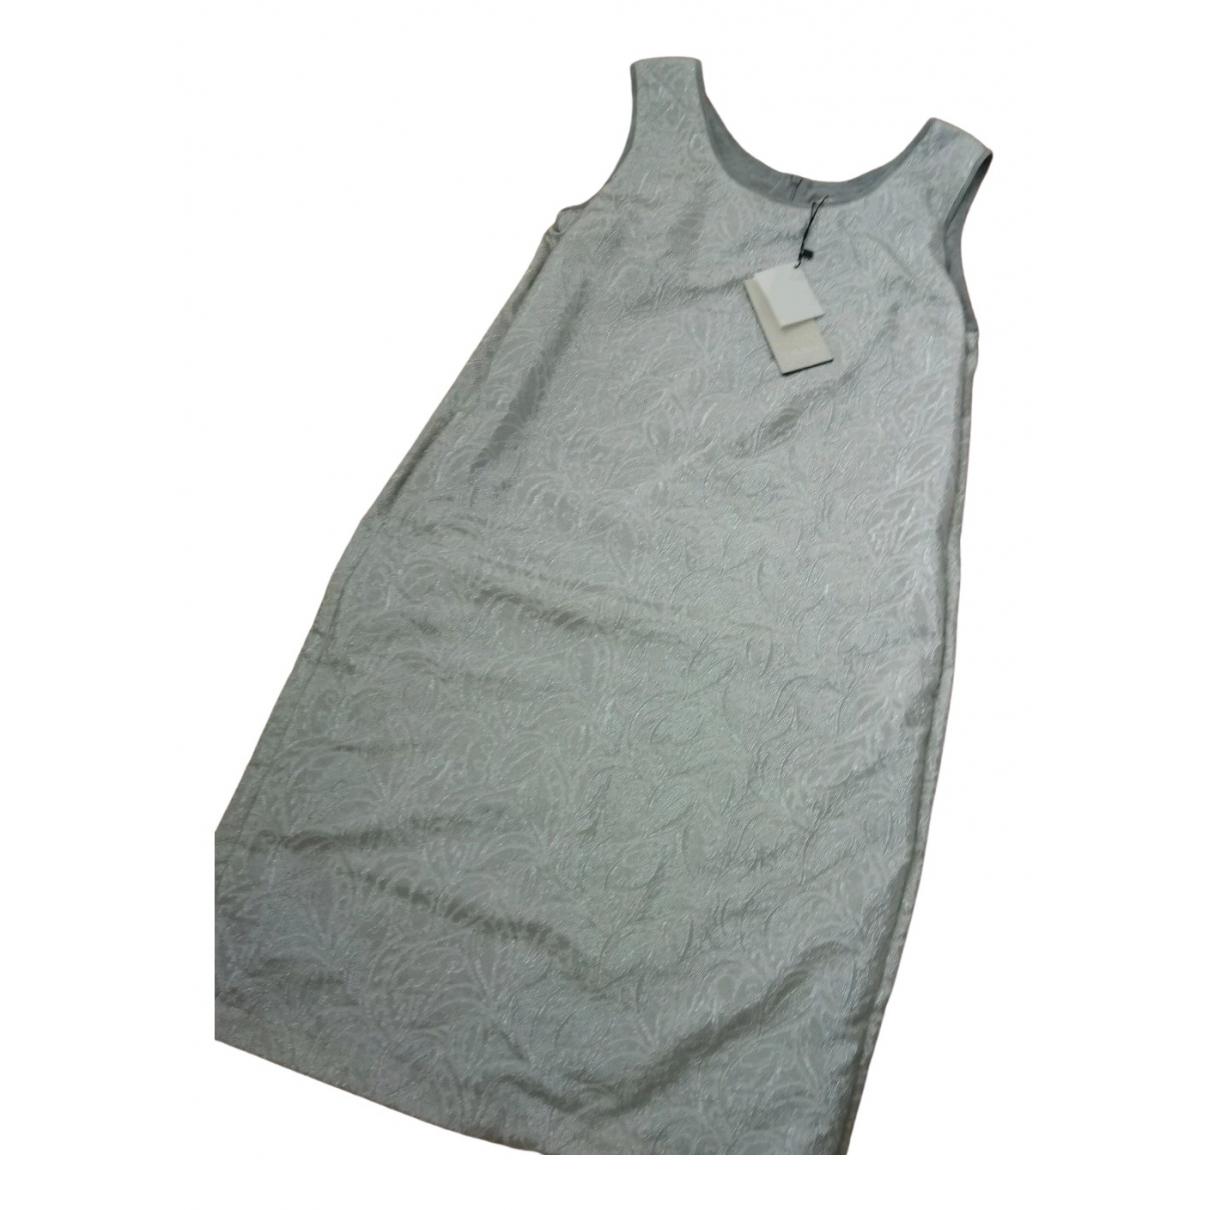 Max Mara s \N Kleid in  Silber Polyester